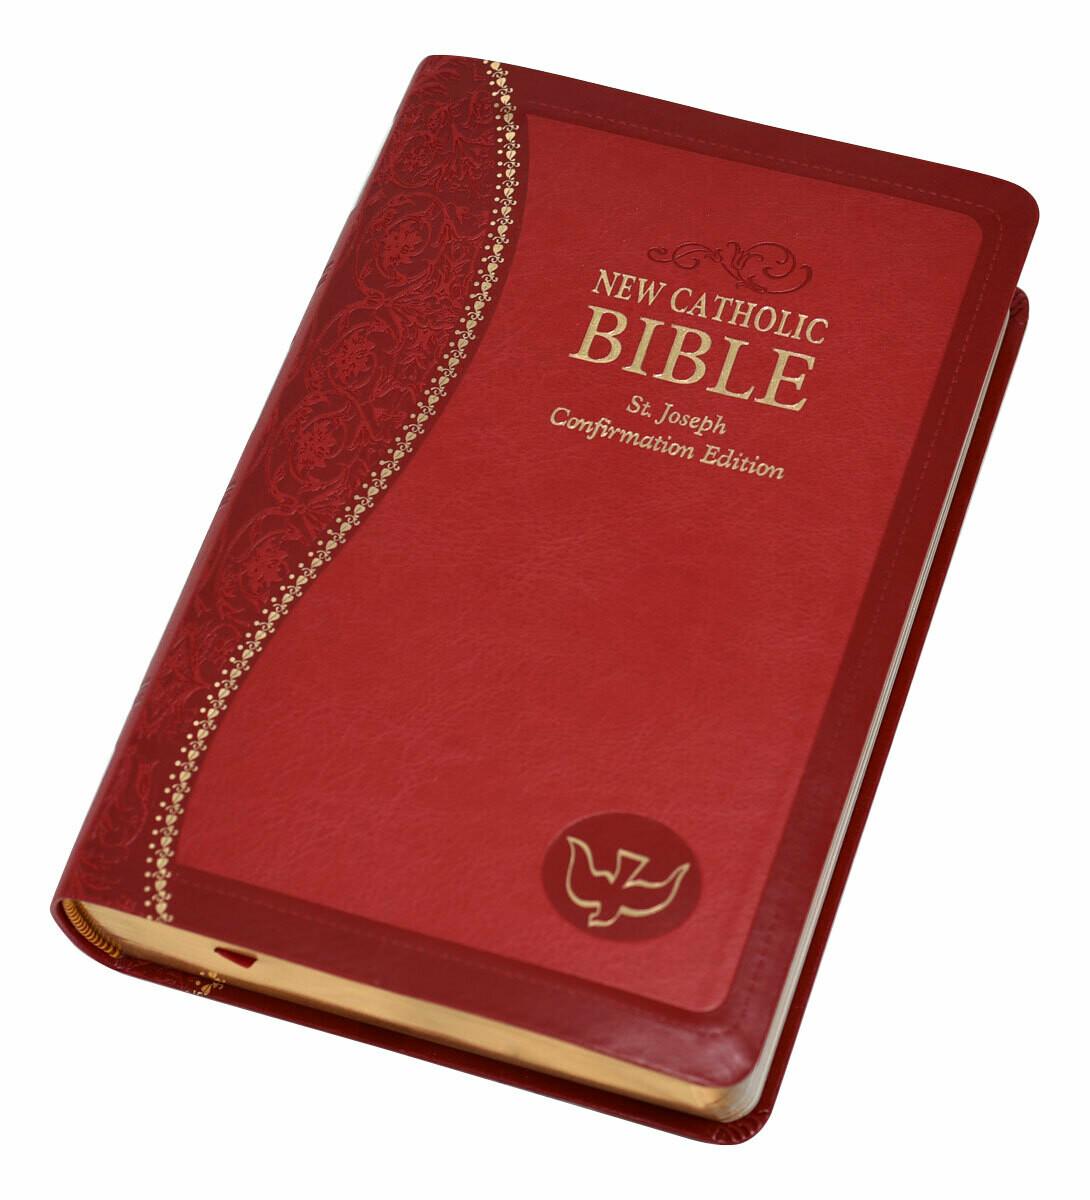 St. Joseph New Catholic Bible Confirmation Edition